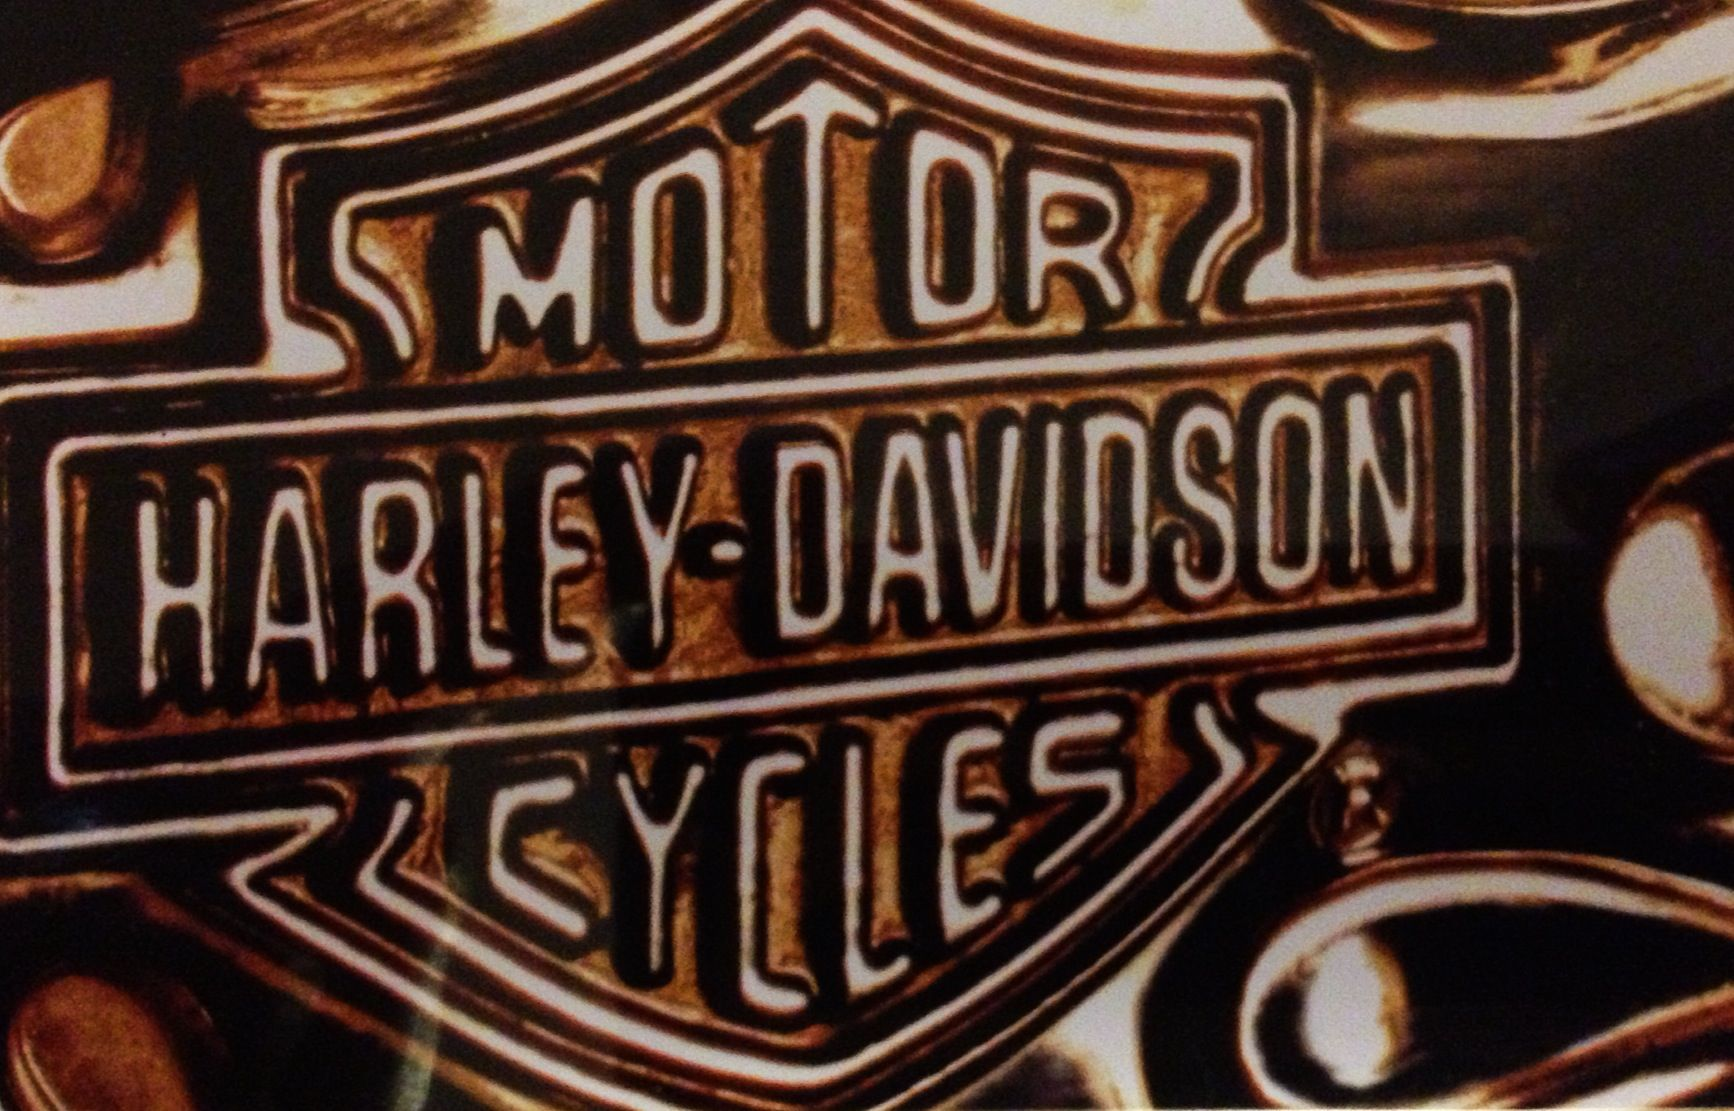 Harley gift card harley davidson gifts harley harley